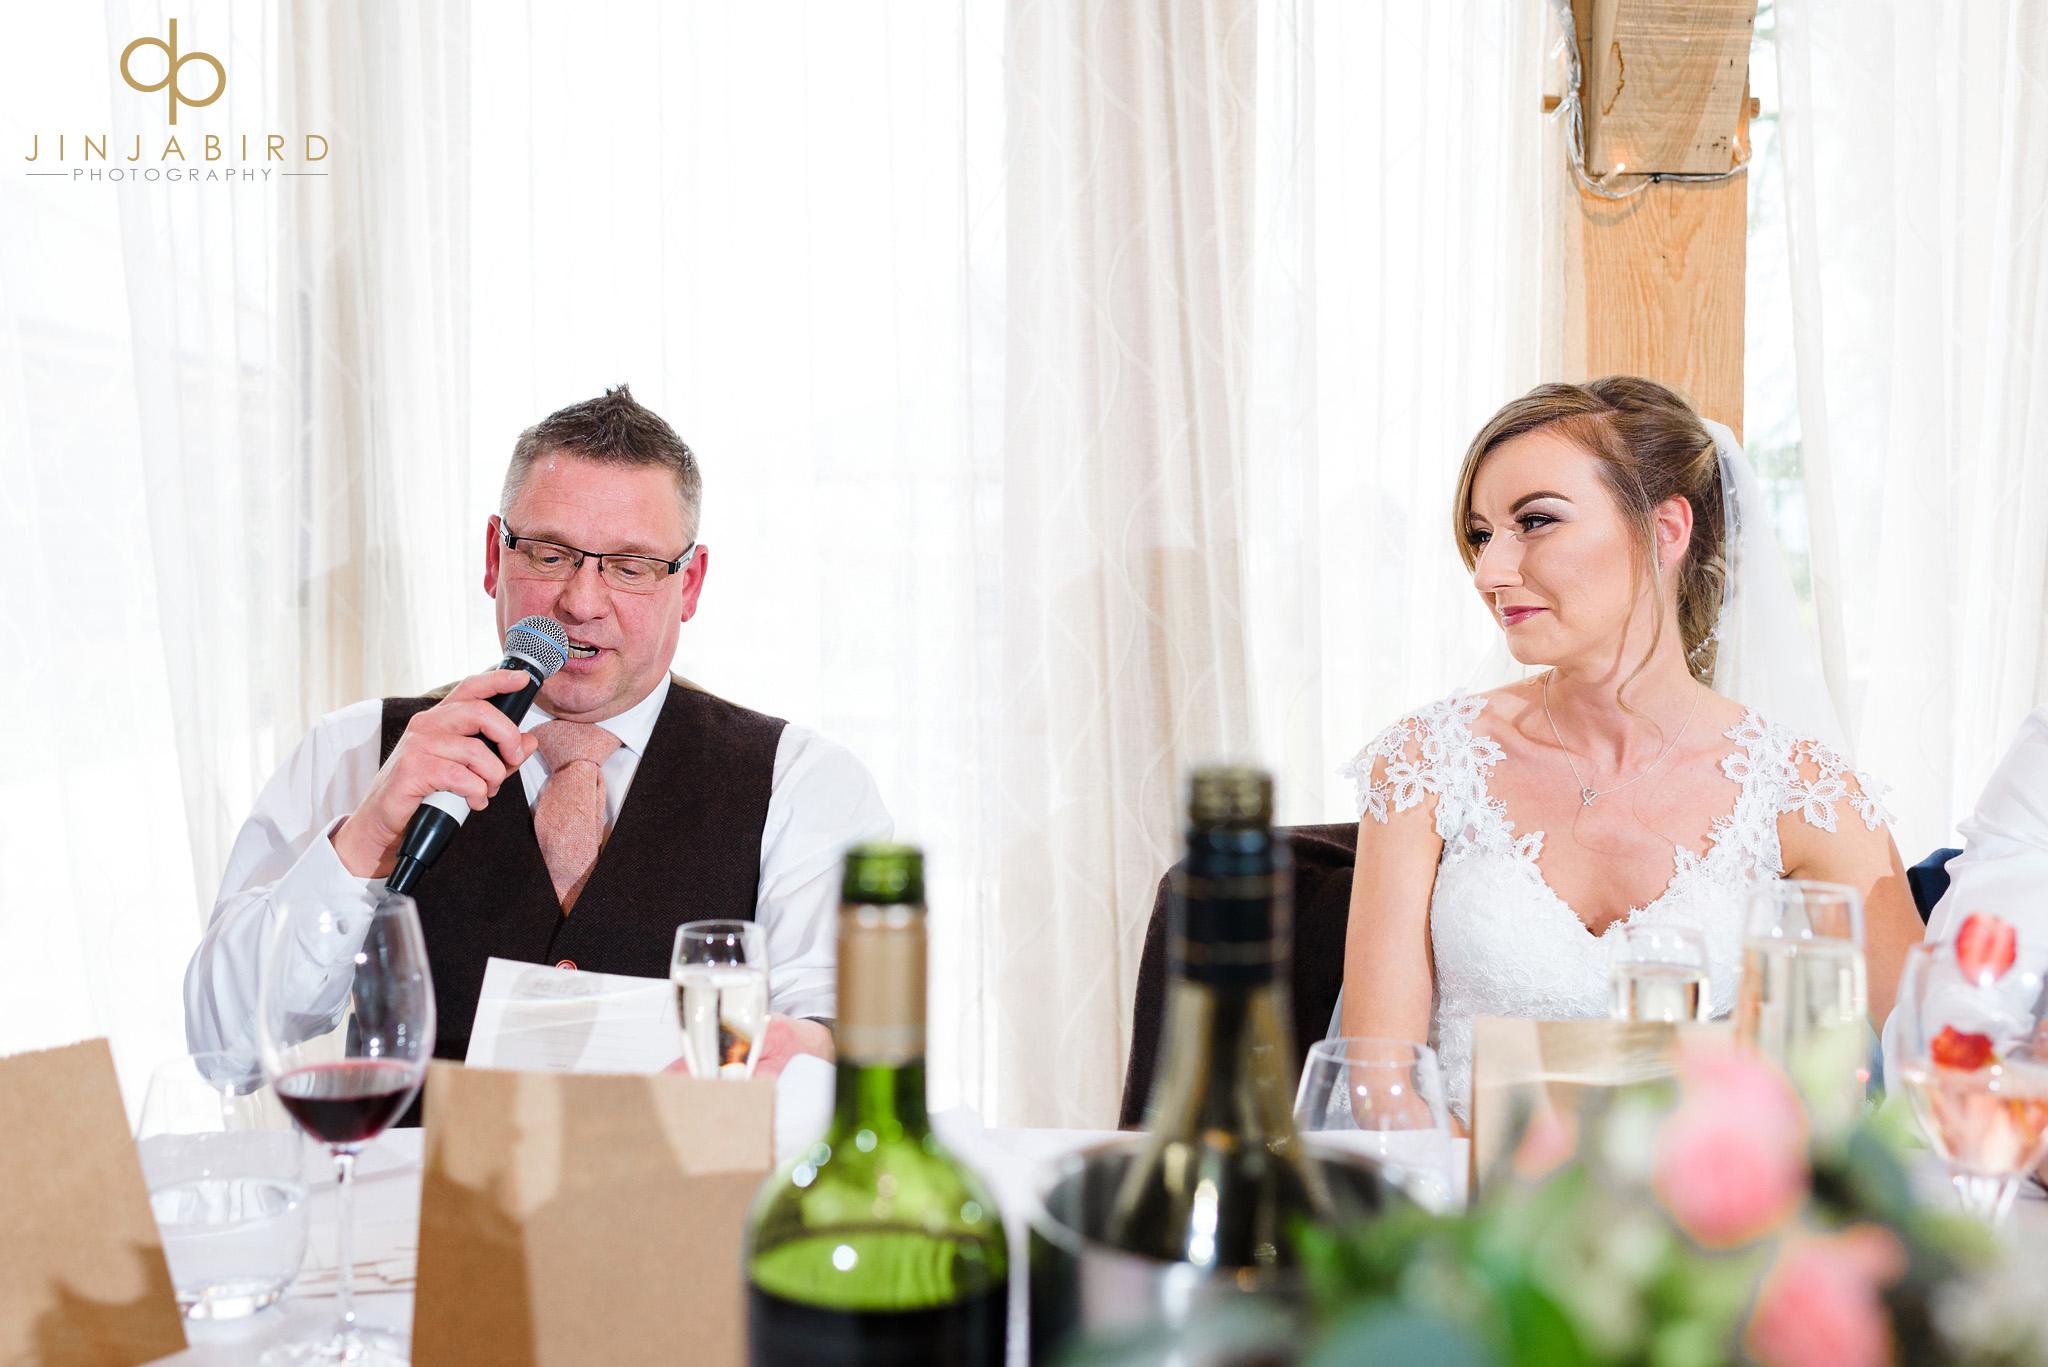 brides-father-making-speech